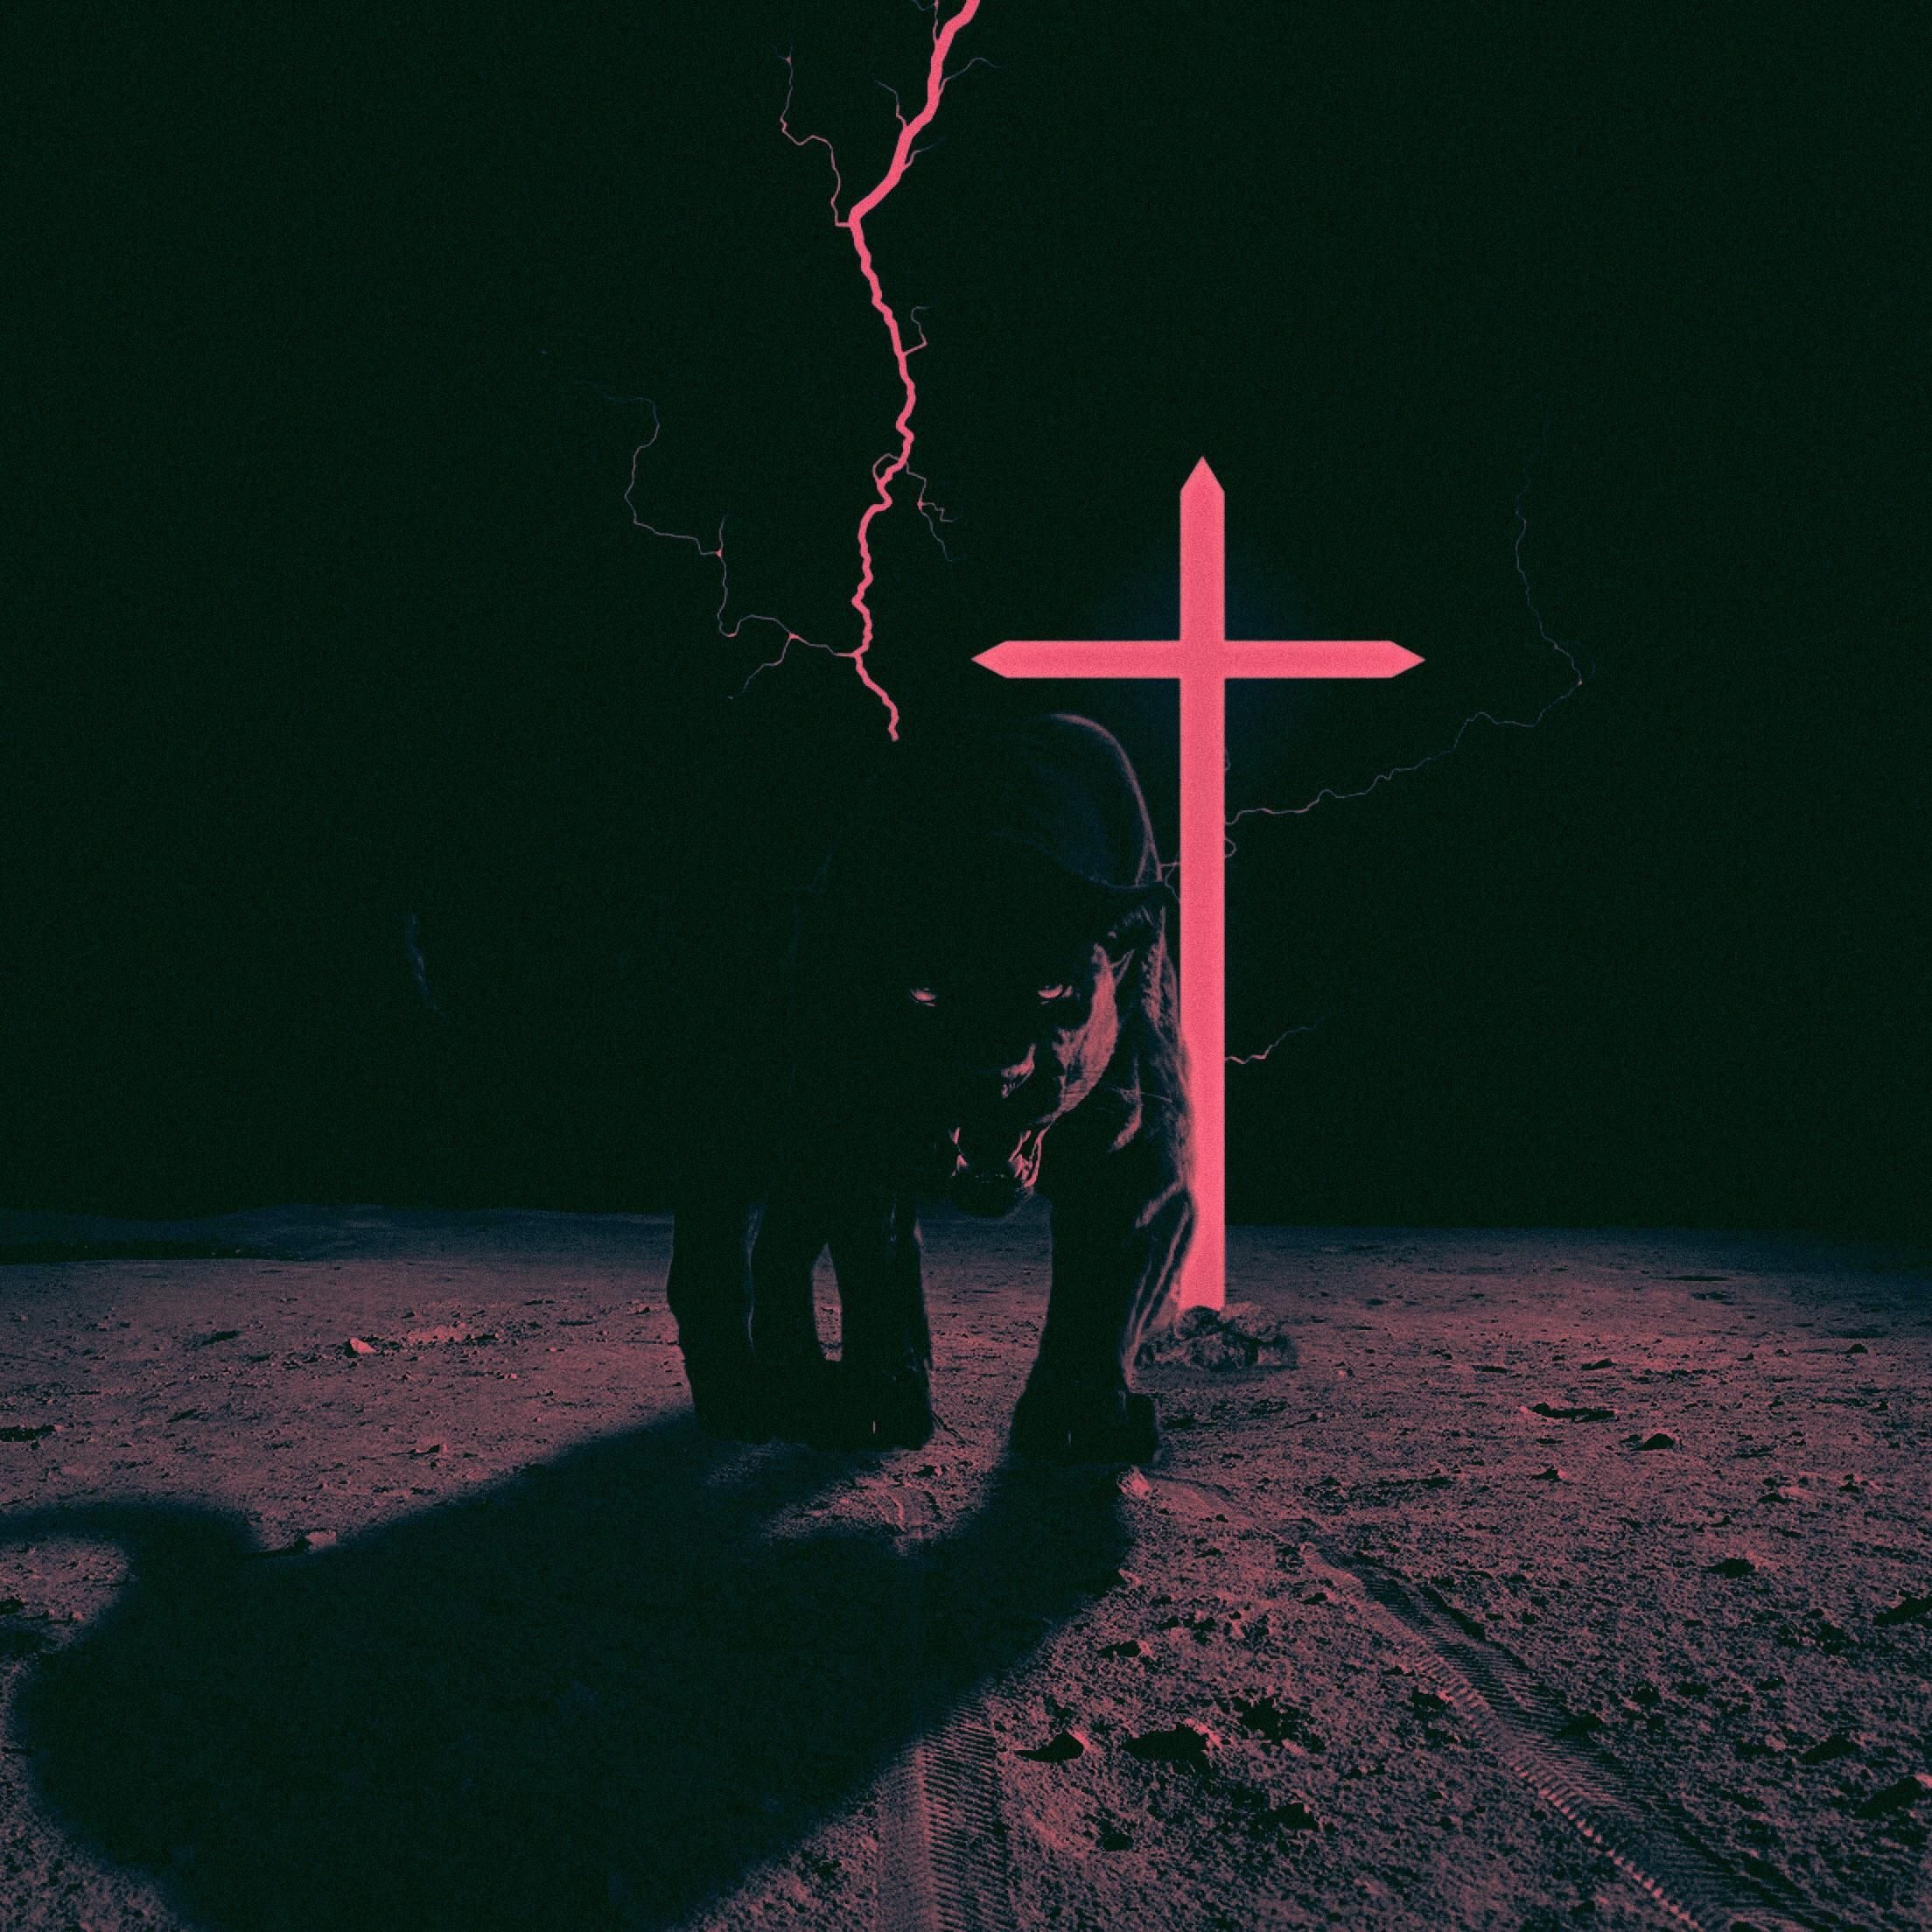 The Weeknd Starboy Fotoğraf, Resim